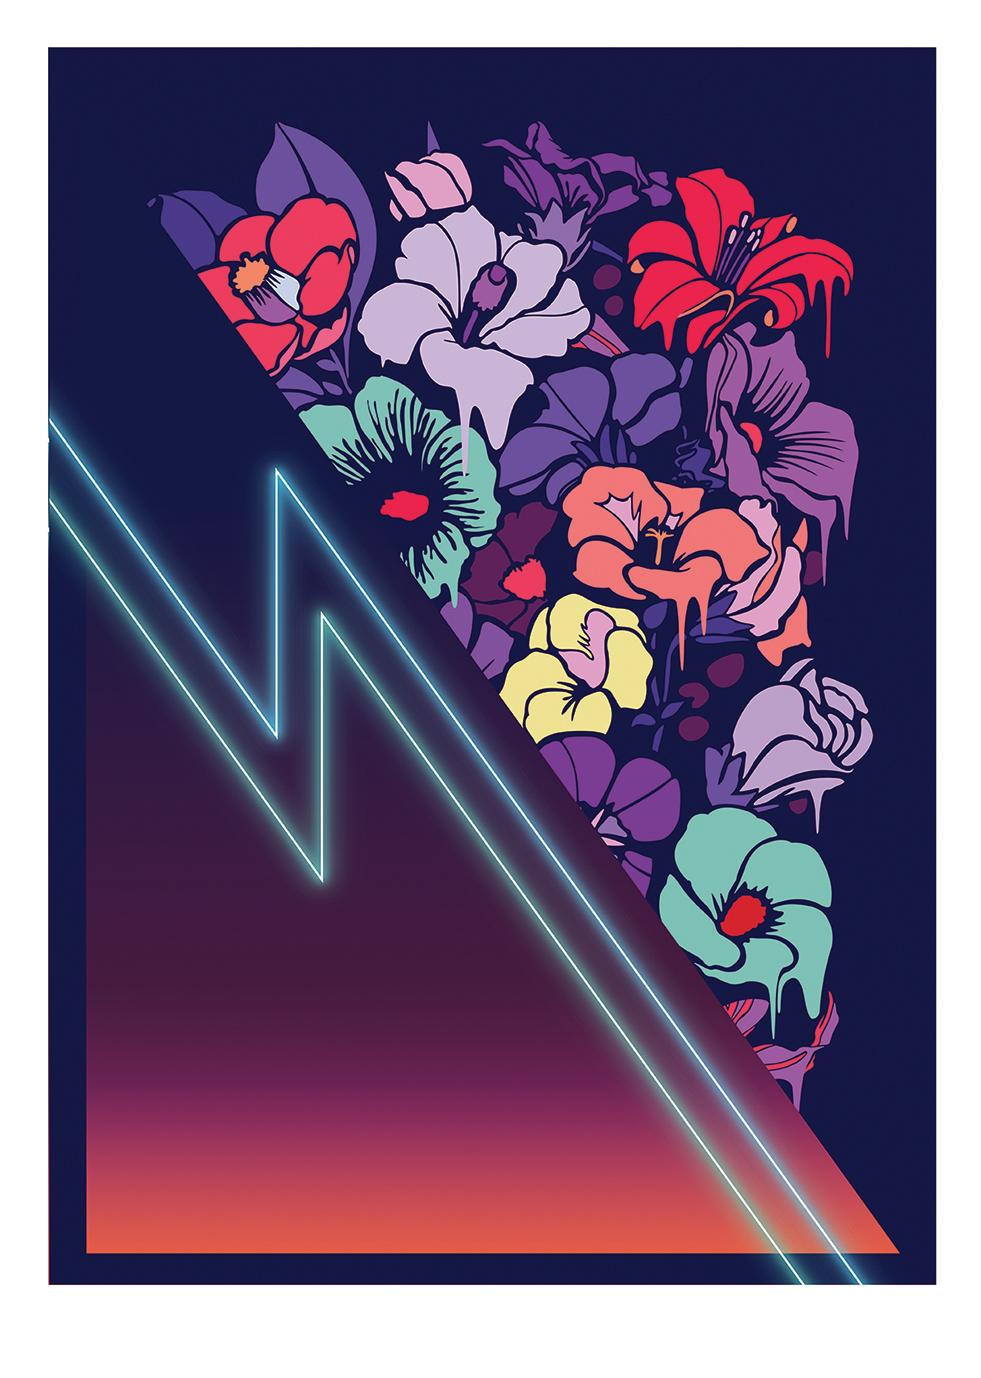 Nerone-neon-art-station-graphic-design